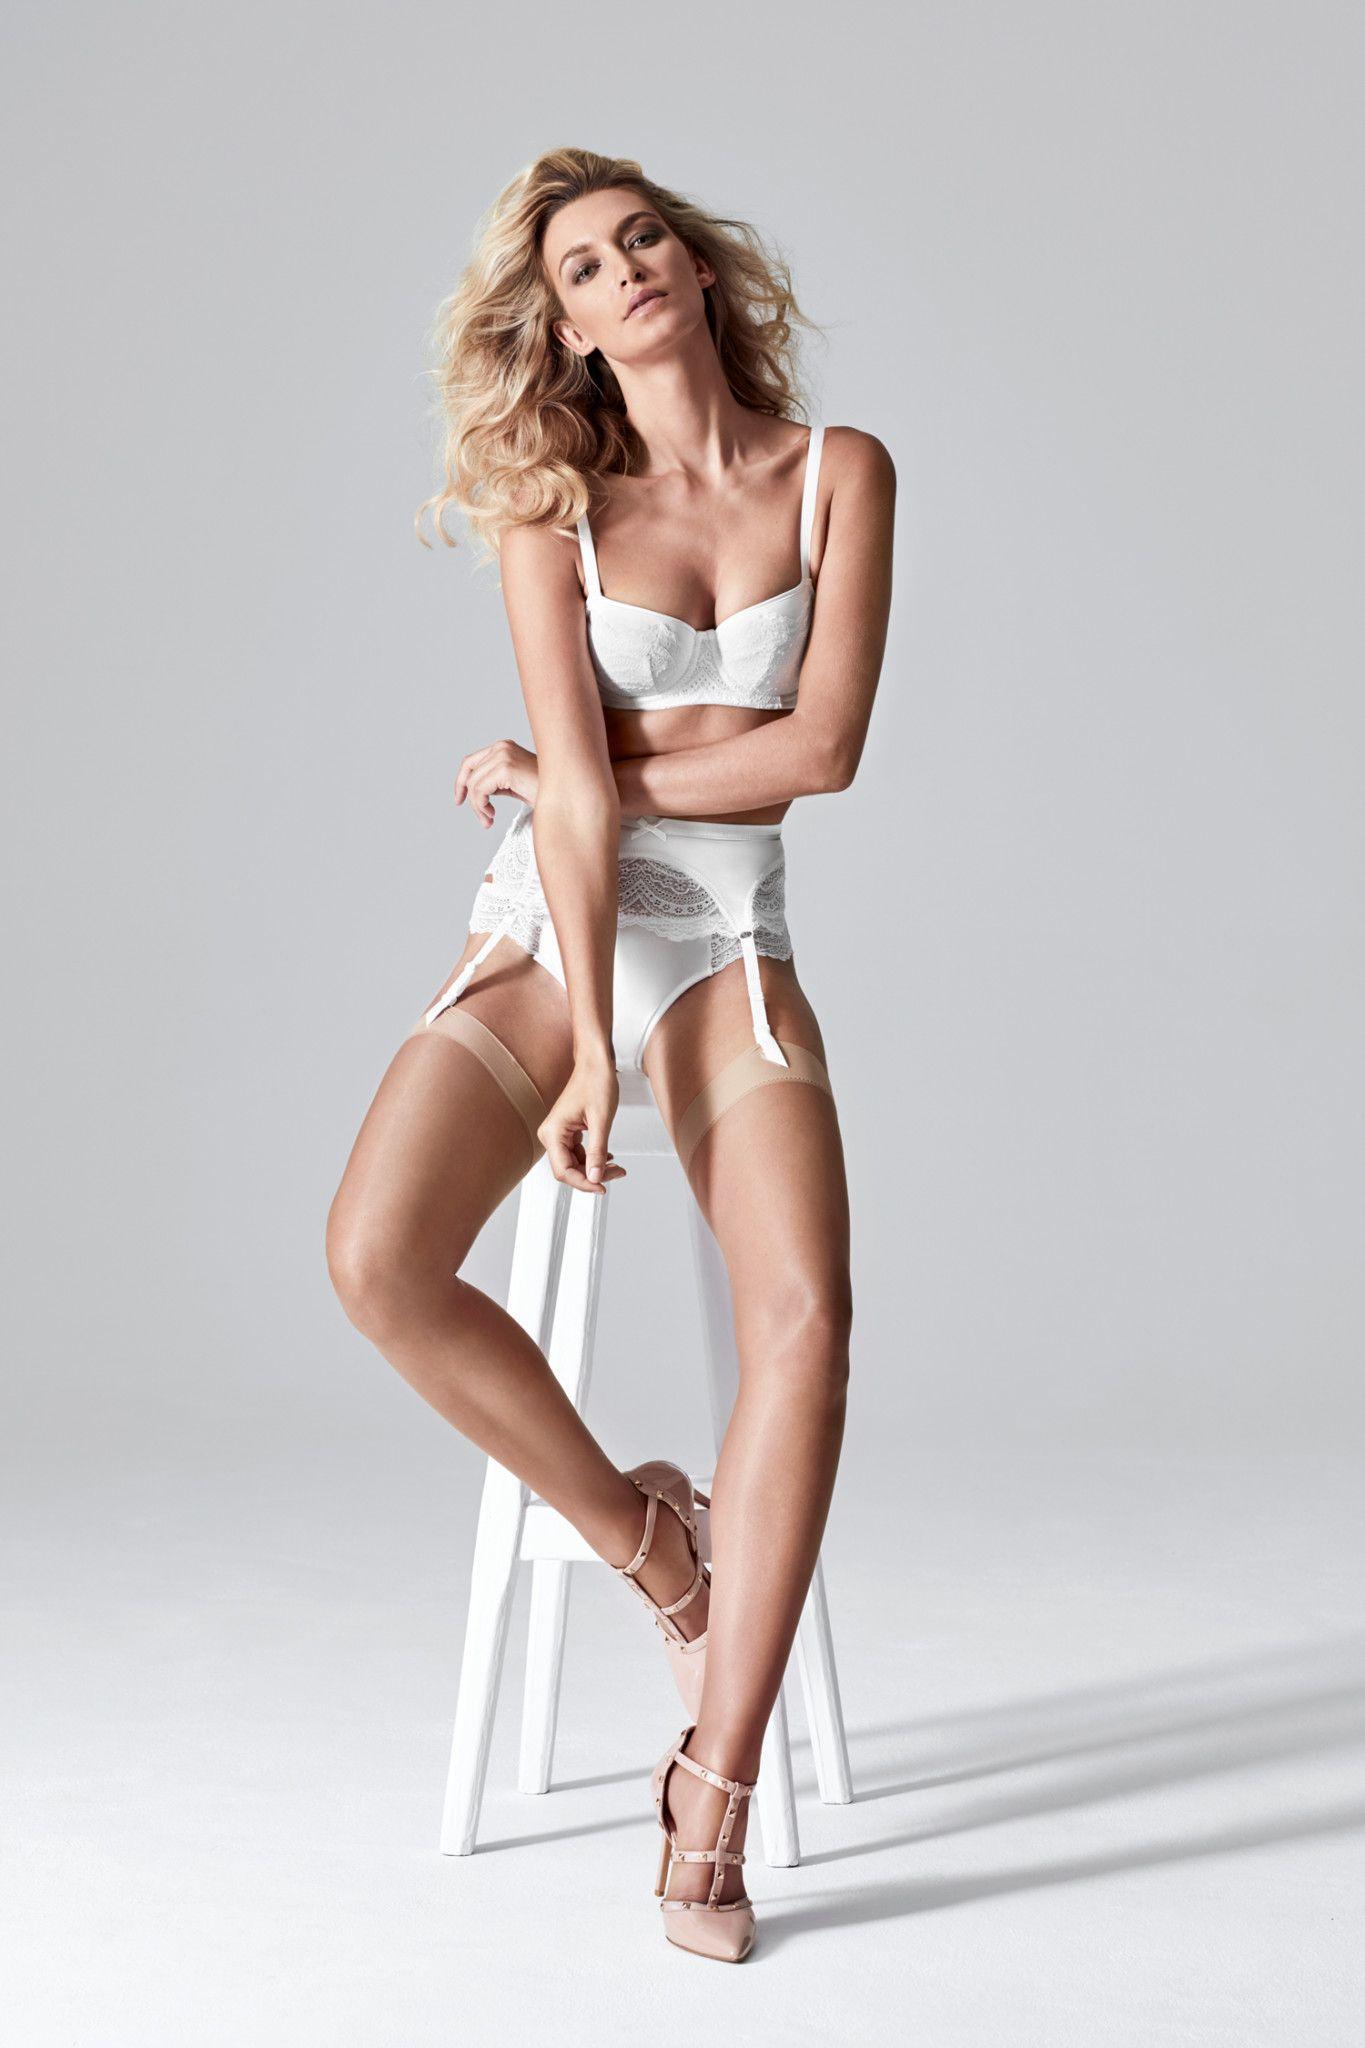 Laura hamilton lingerie nudes (98 photos), Instagram Celebrity photos